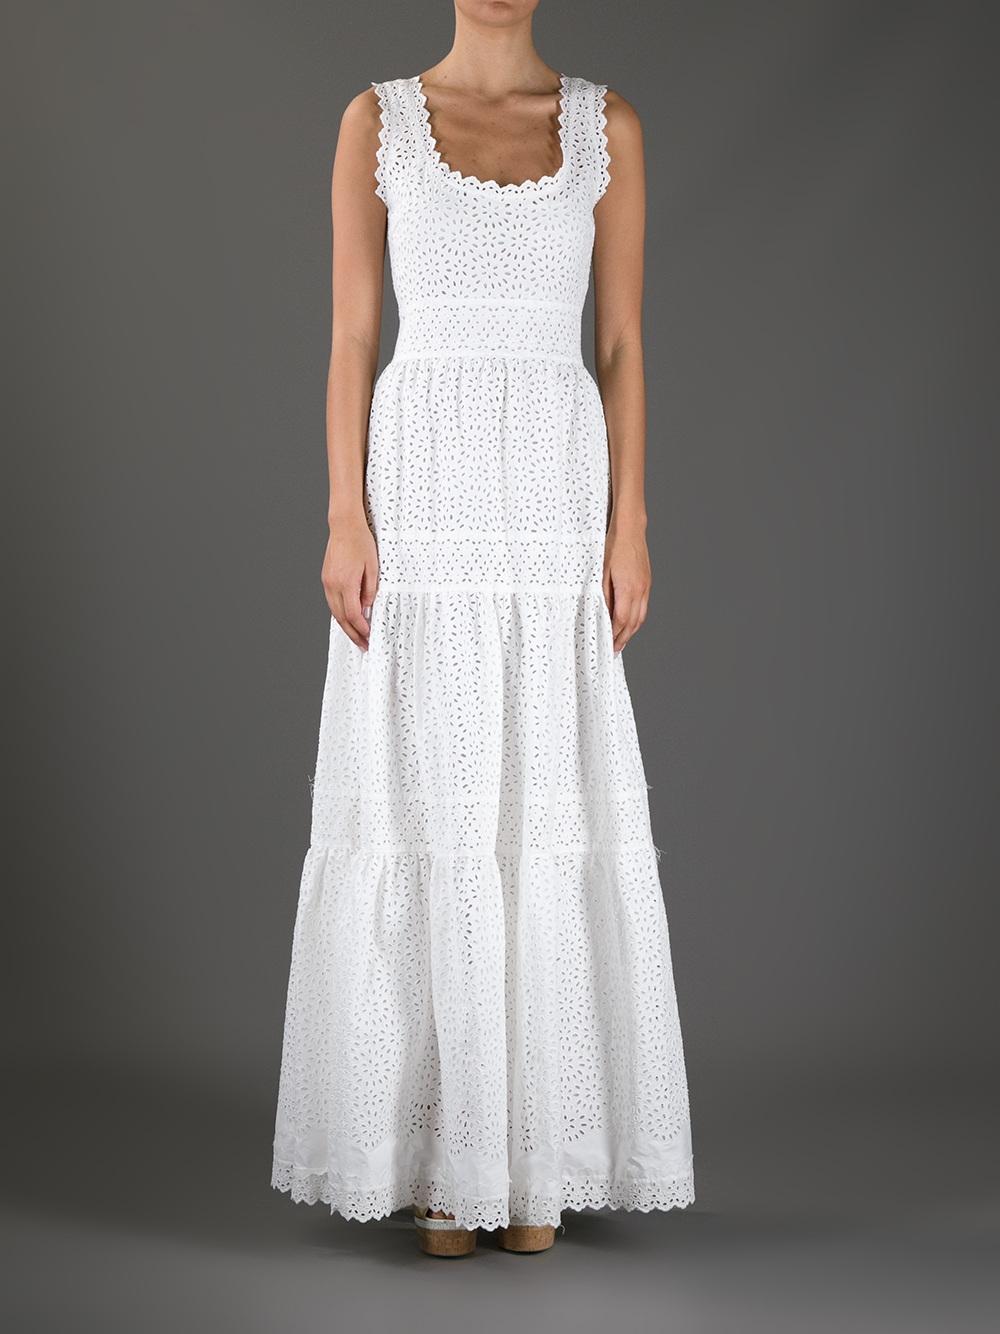 2 in 1 maxi dress 00